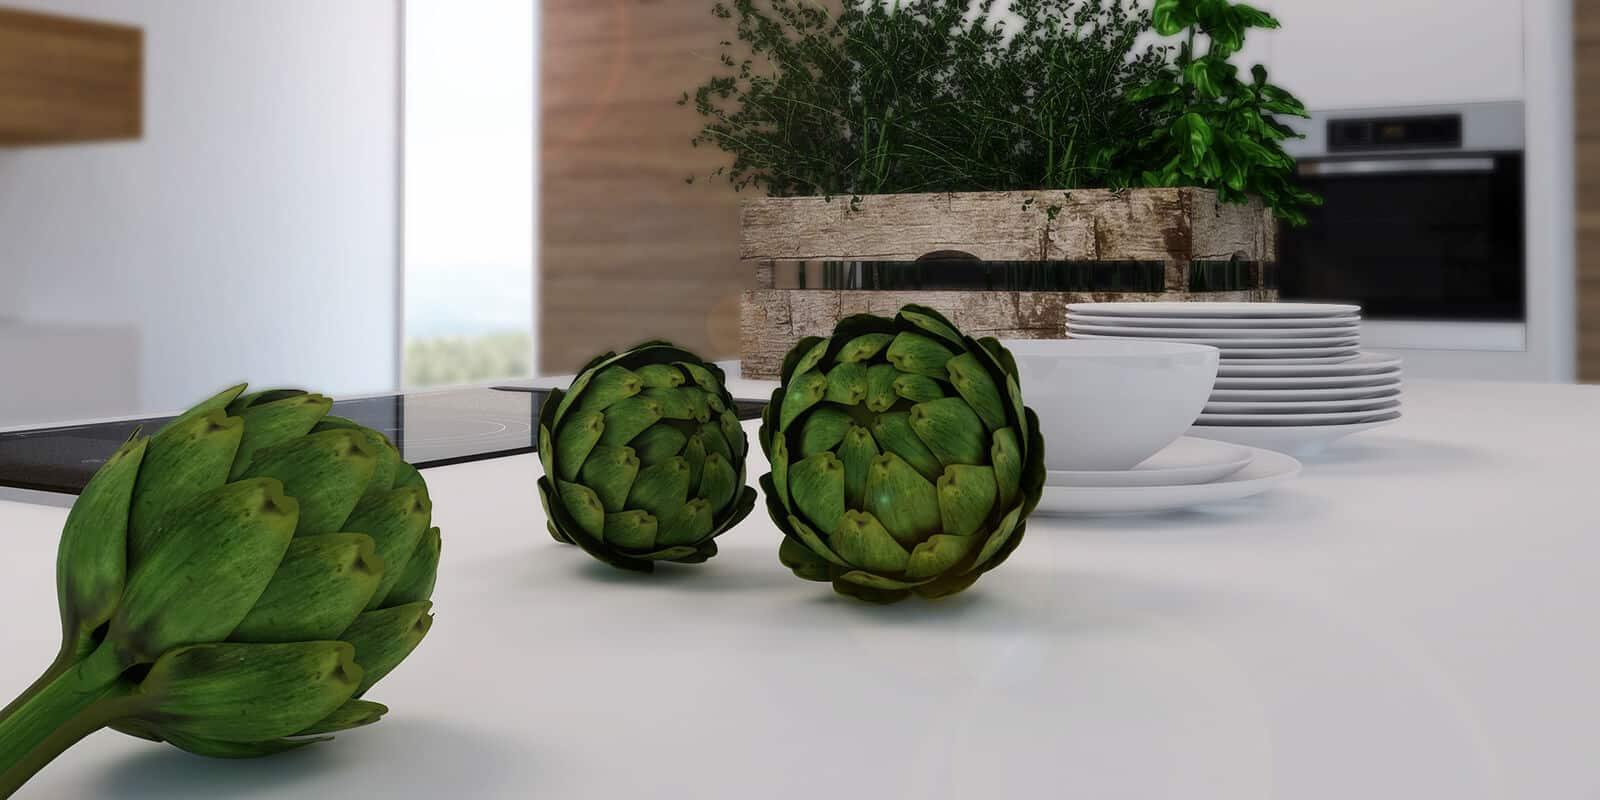 Web3D - תלת מימד - צילום שולחן אוכל עם ארטישוקים